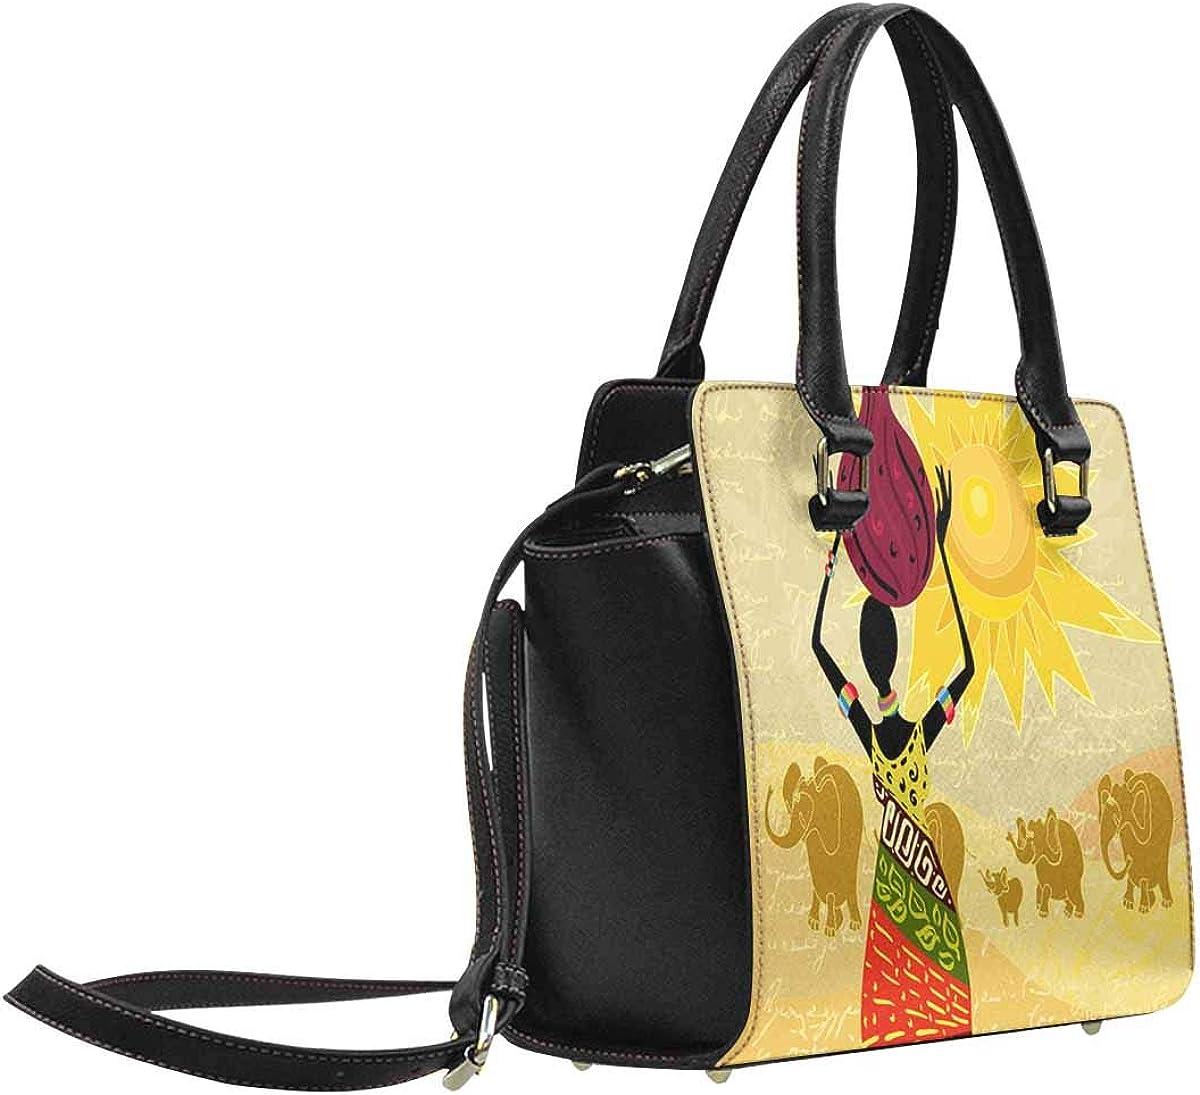 InterestPrint Japan Concept Japanese Wave Fuji Mountain Maples Top Handle Satchel Purse for Woman Work Tote Shoulder Bag